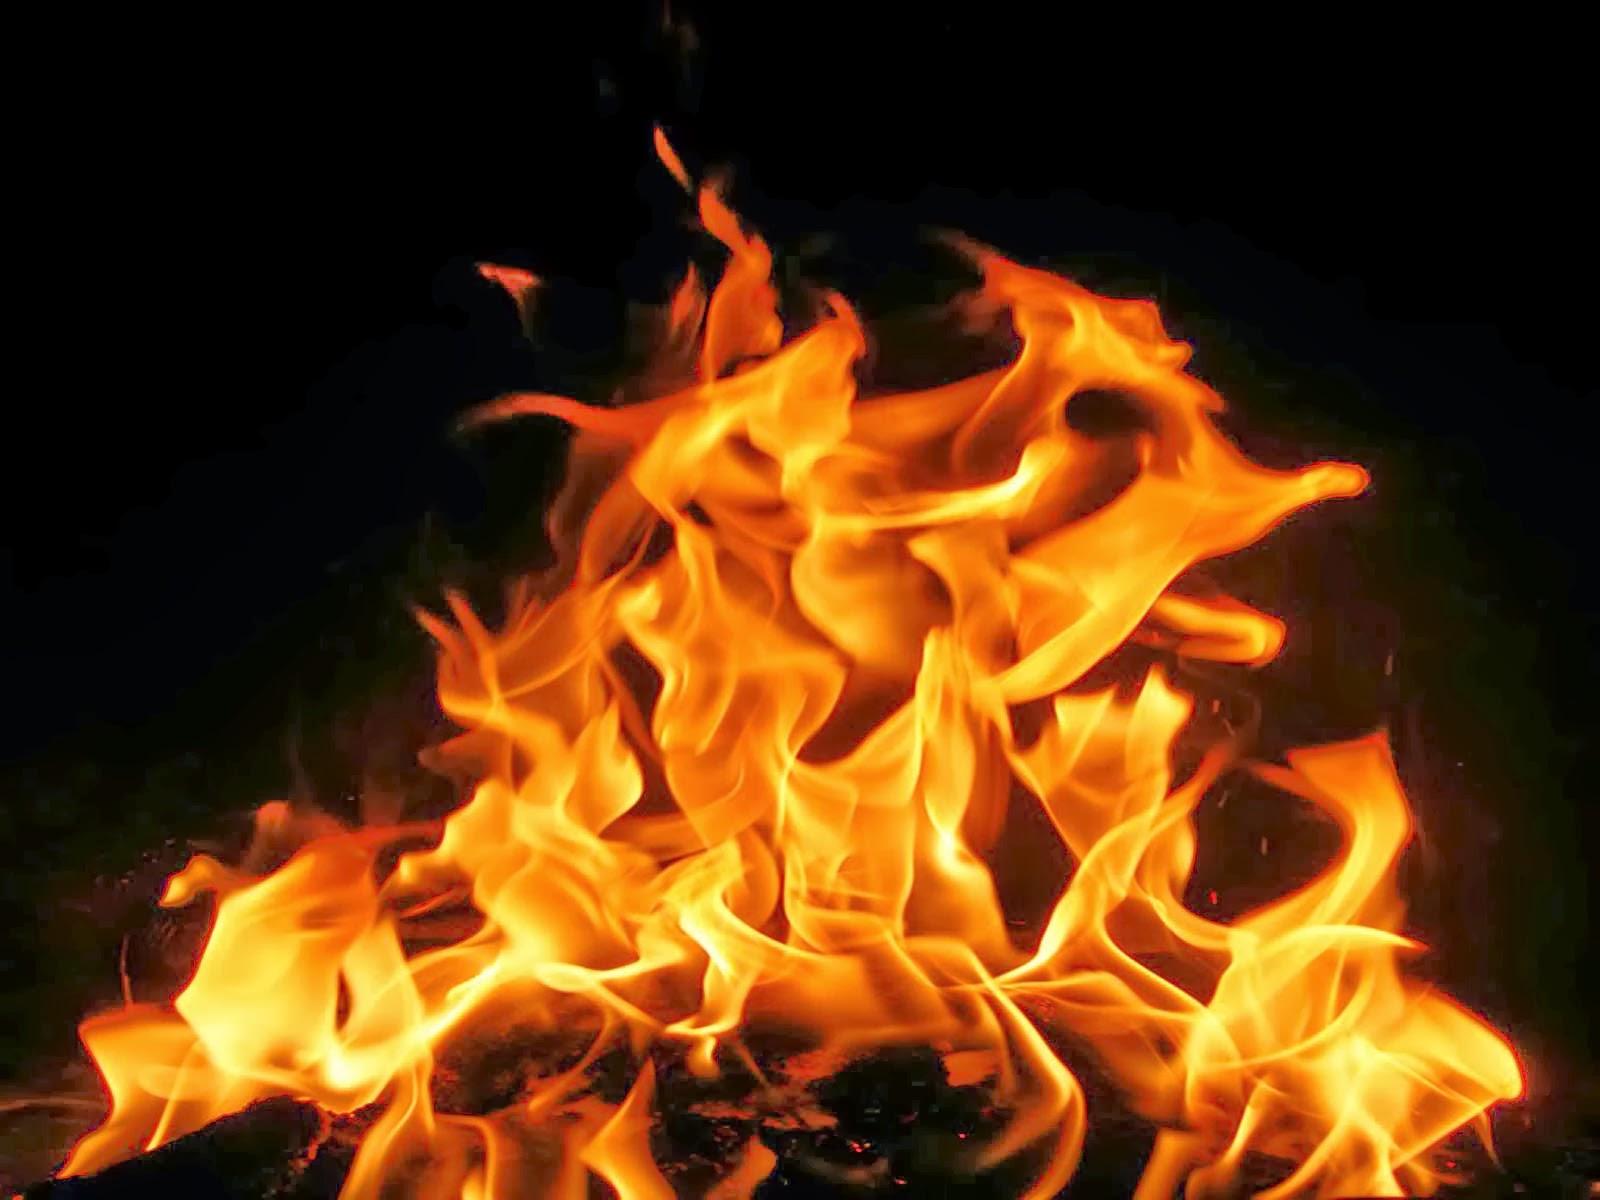 Real Flame Screensaver